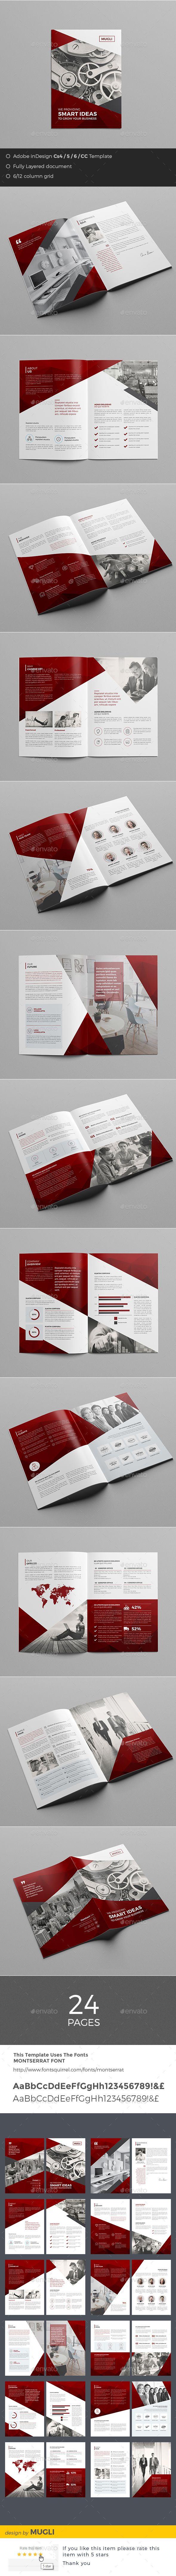 Corporate Brochure Design - Corporate Brochure Template InDesign INDD, Vector AI. Download here: http://graphicriver.net/item/corporate-brochure/16488096?s_rank=123&ref=yinkira